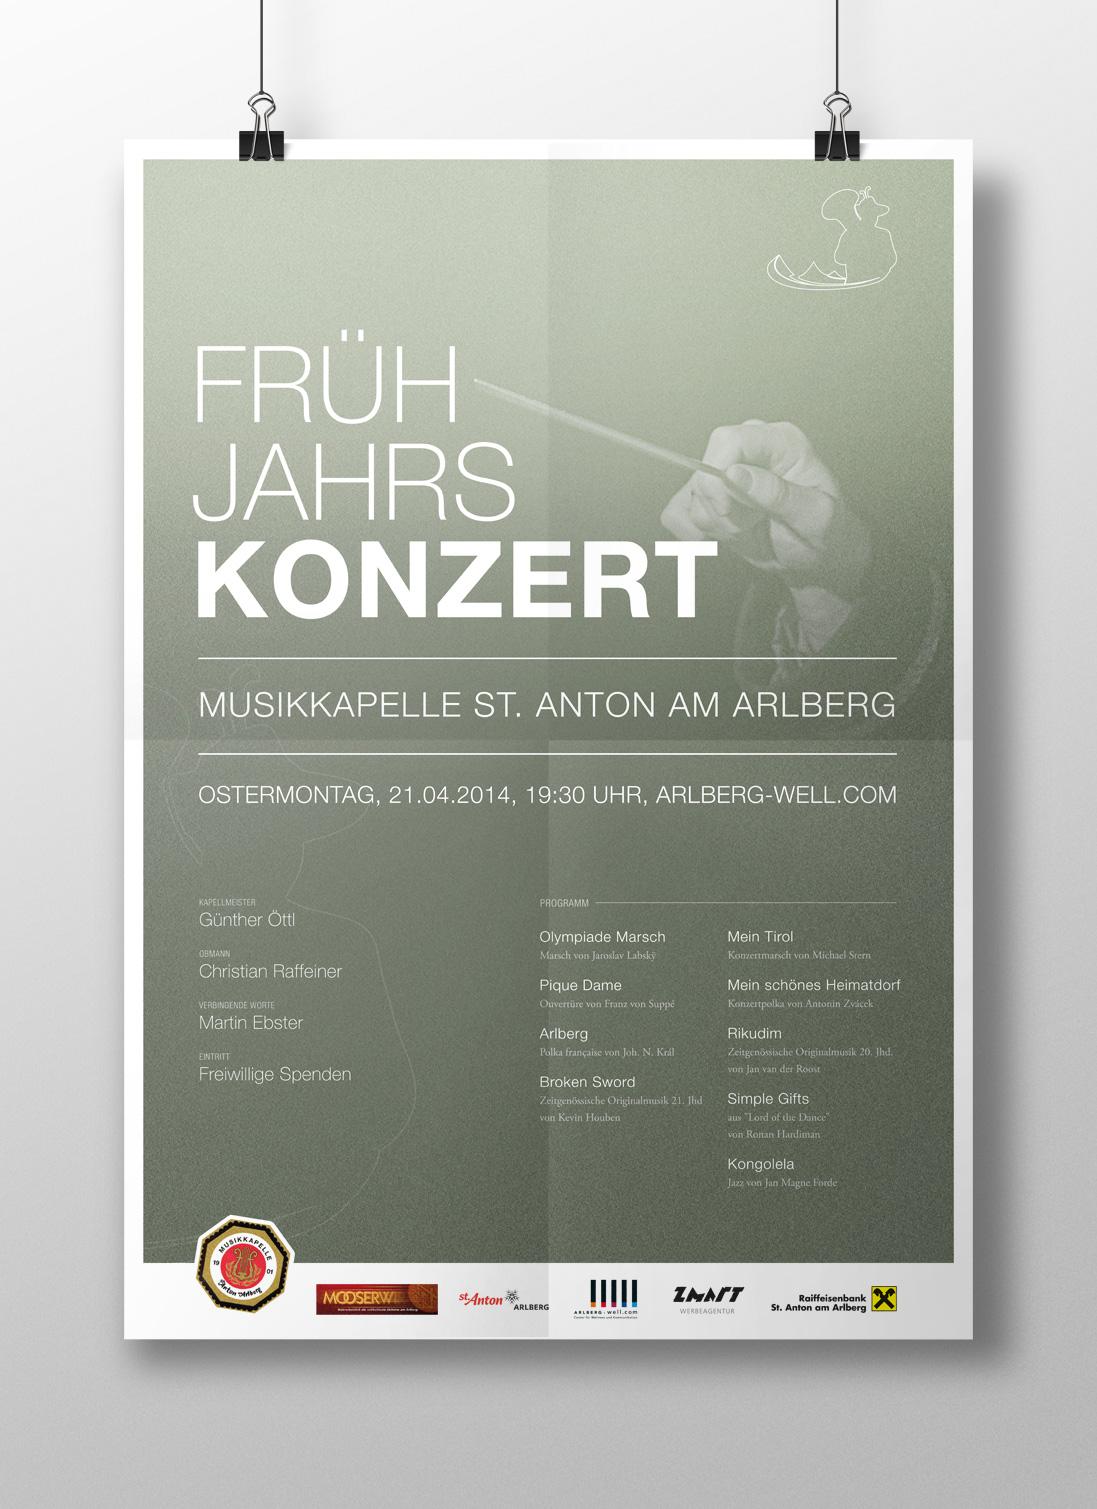 poster_mockup_mkstanton